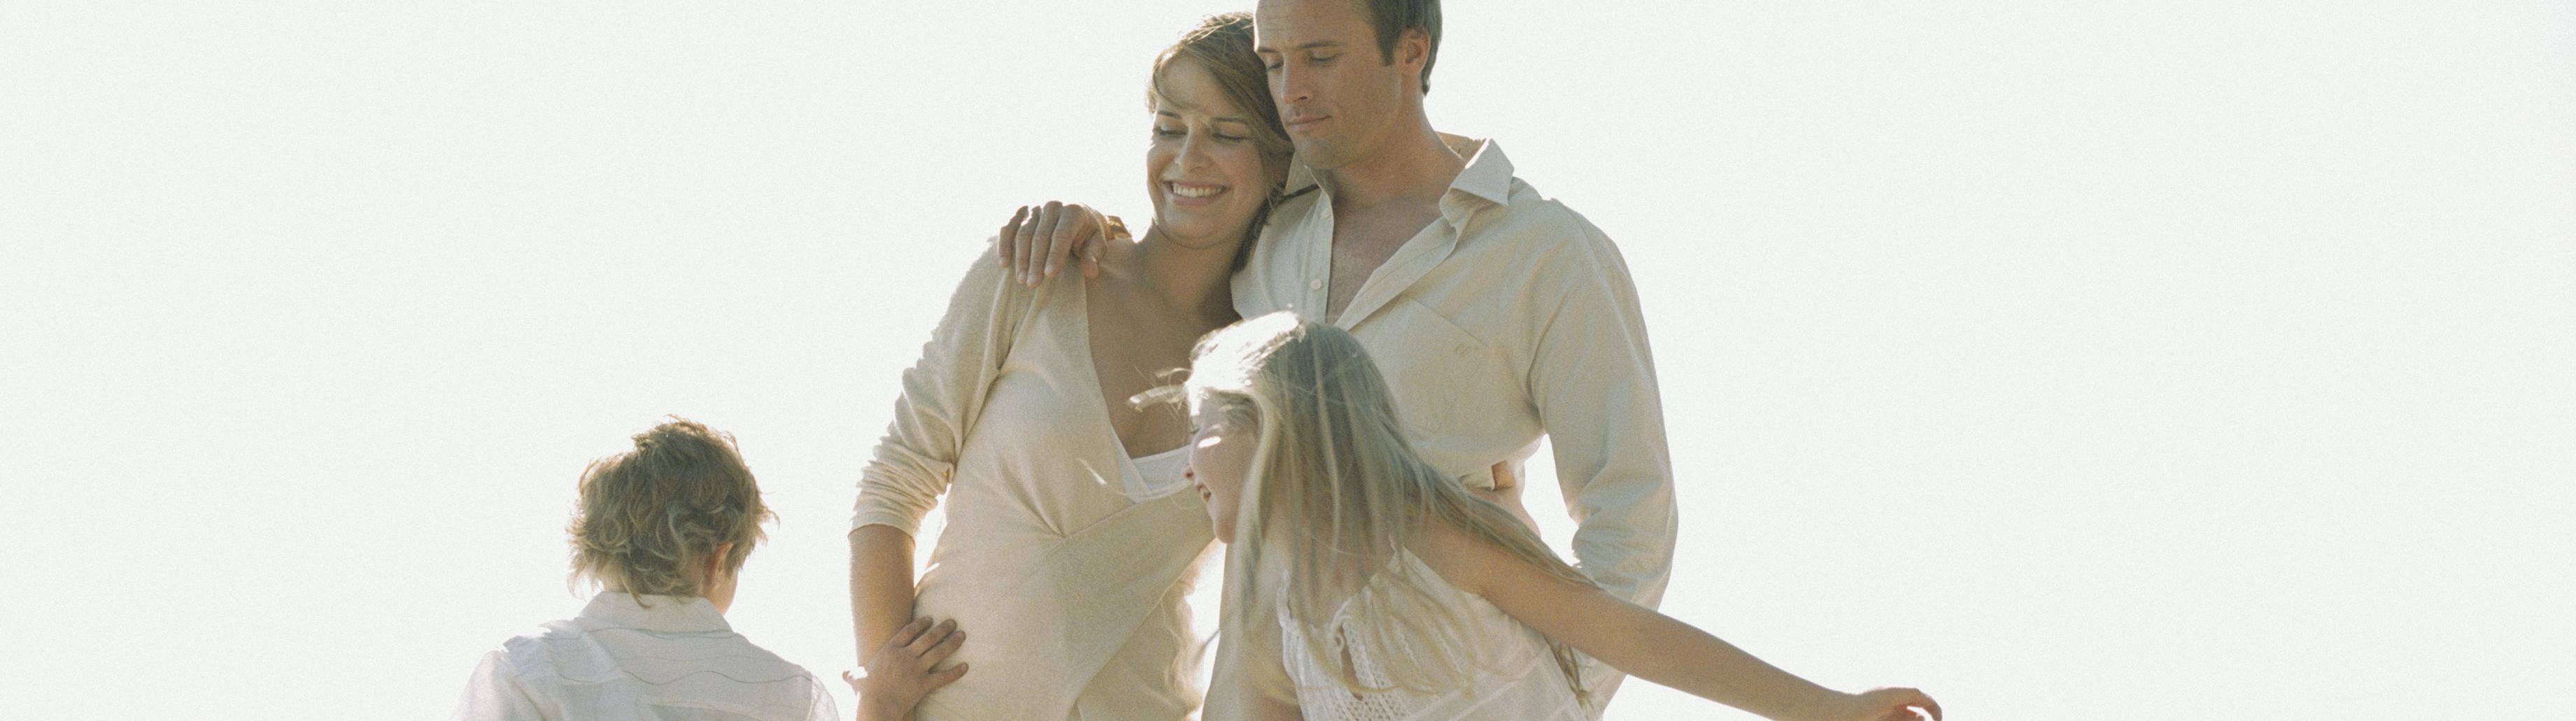 Psykologi i dag dating rådgivning